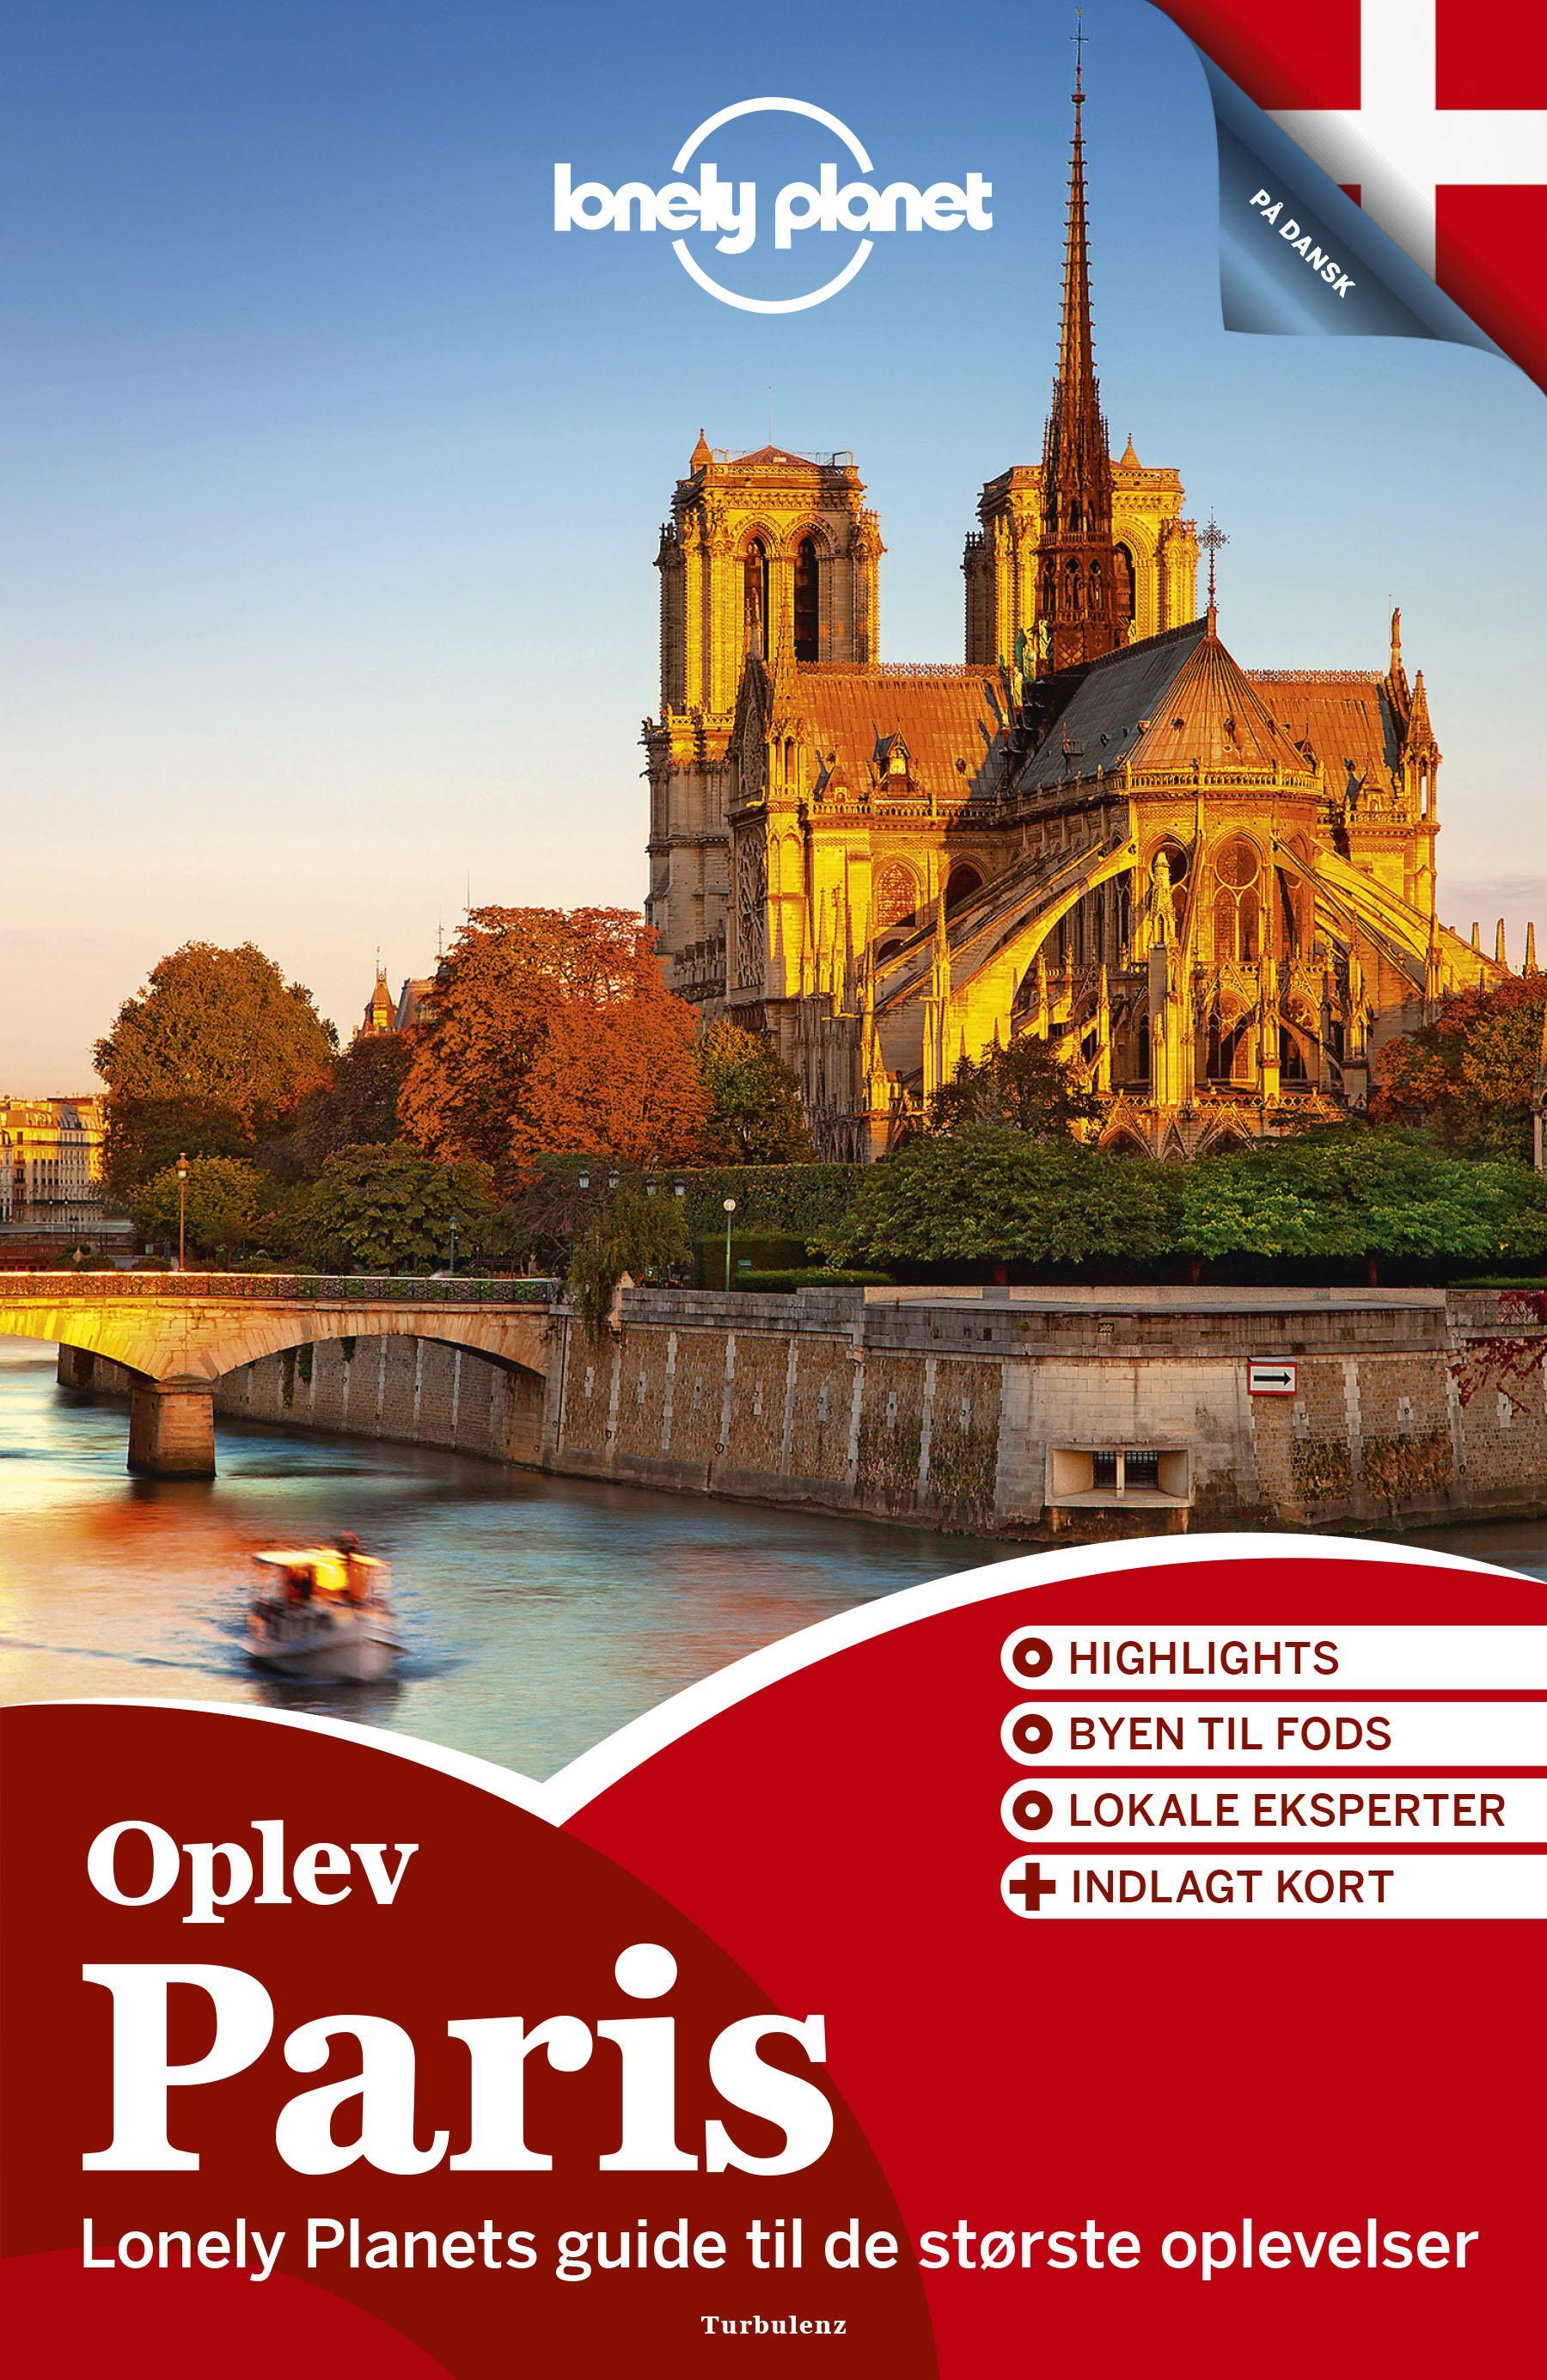 Oplev Paris (Lonely Planet)